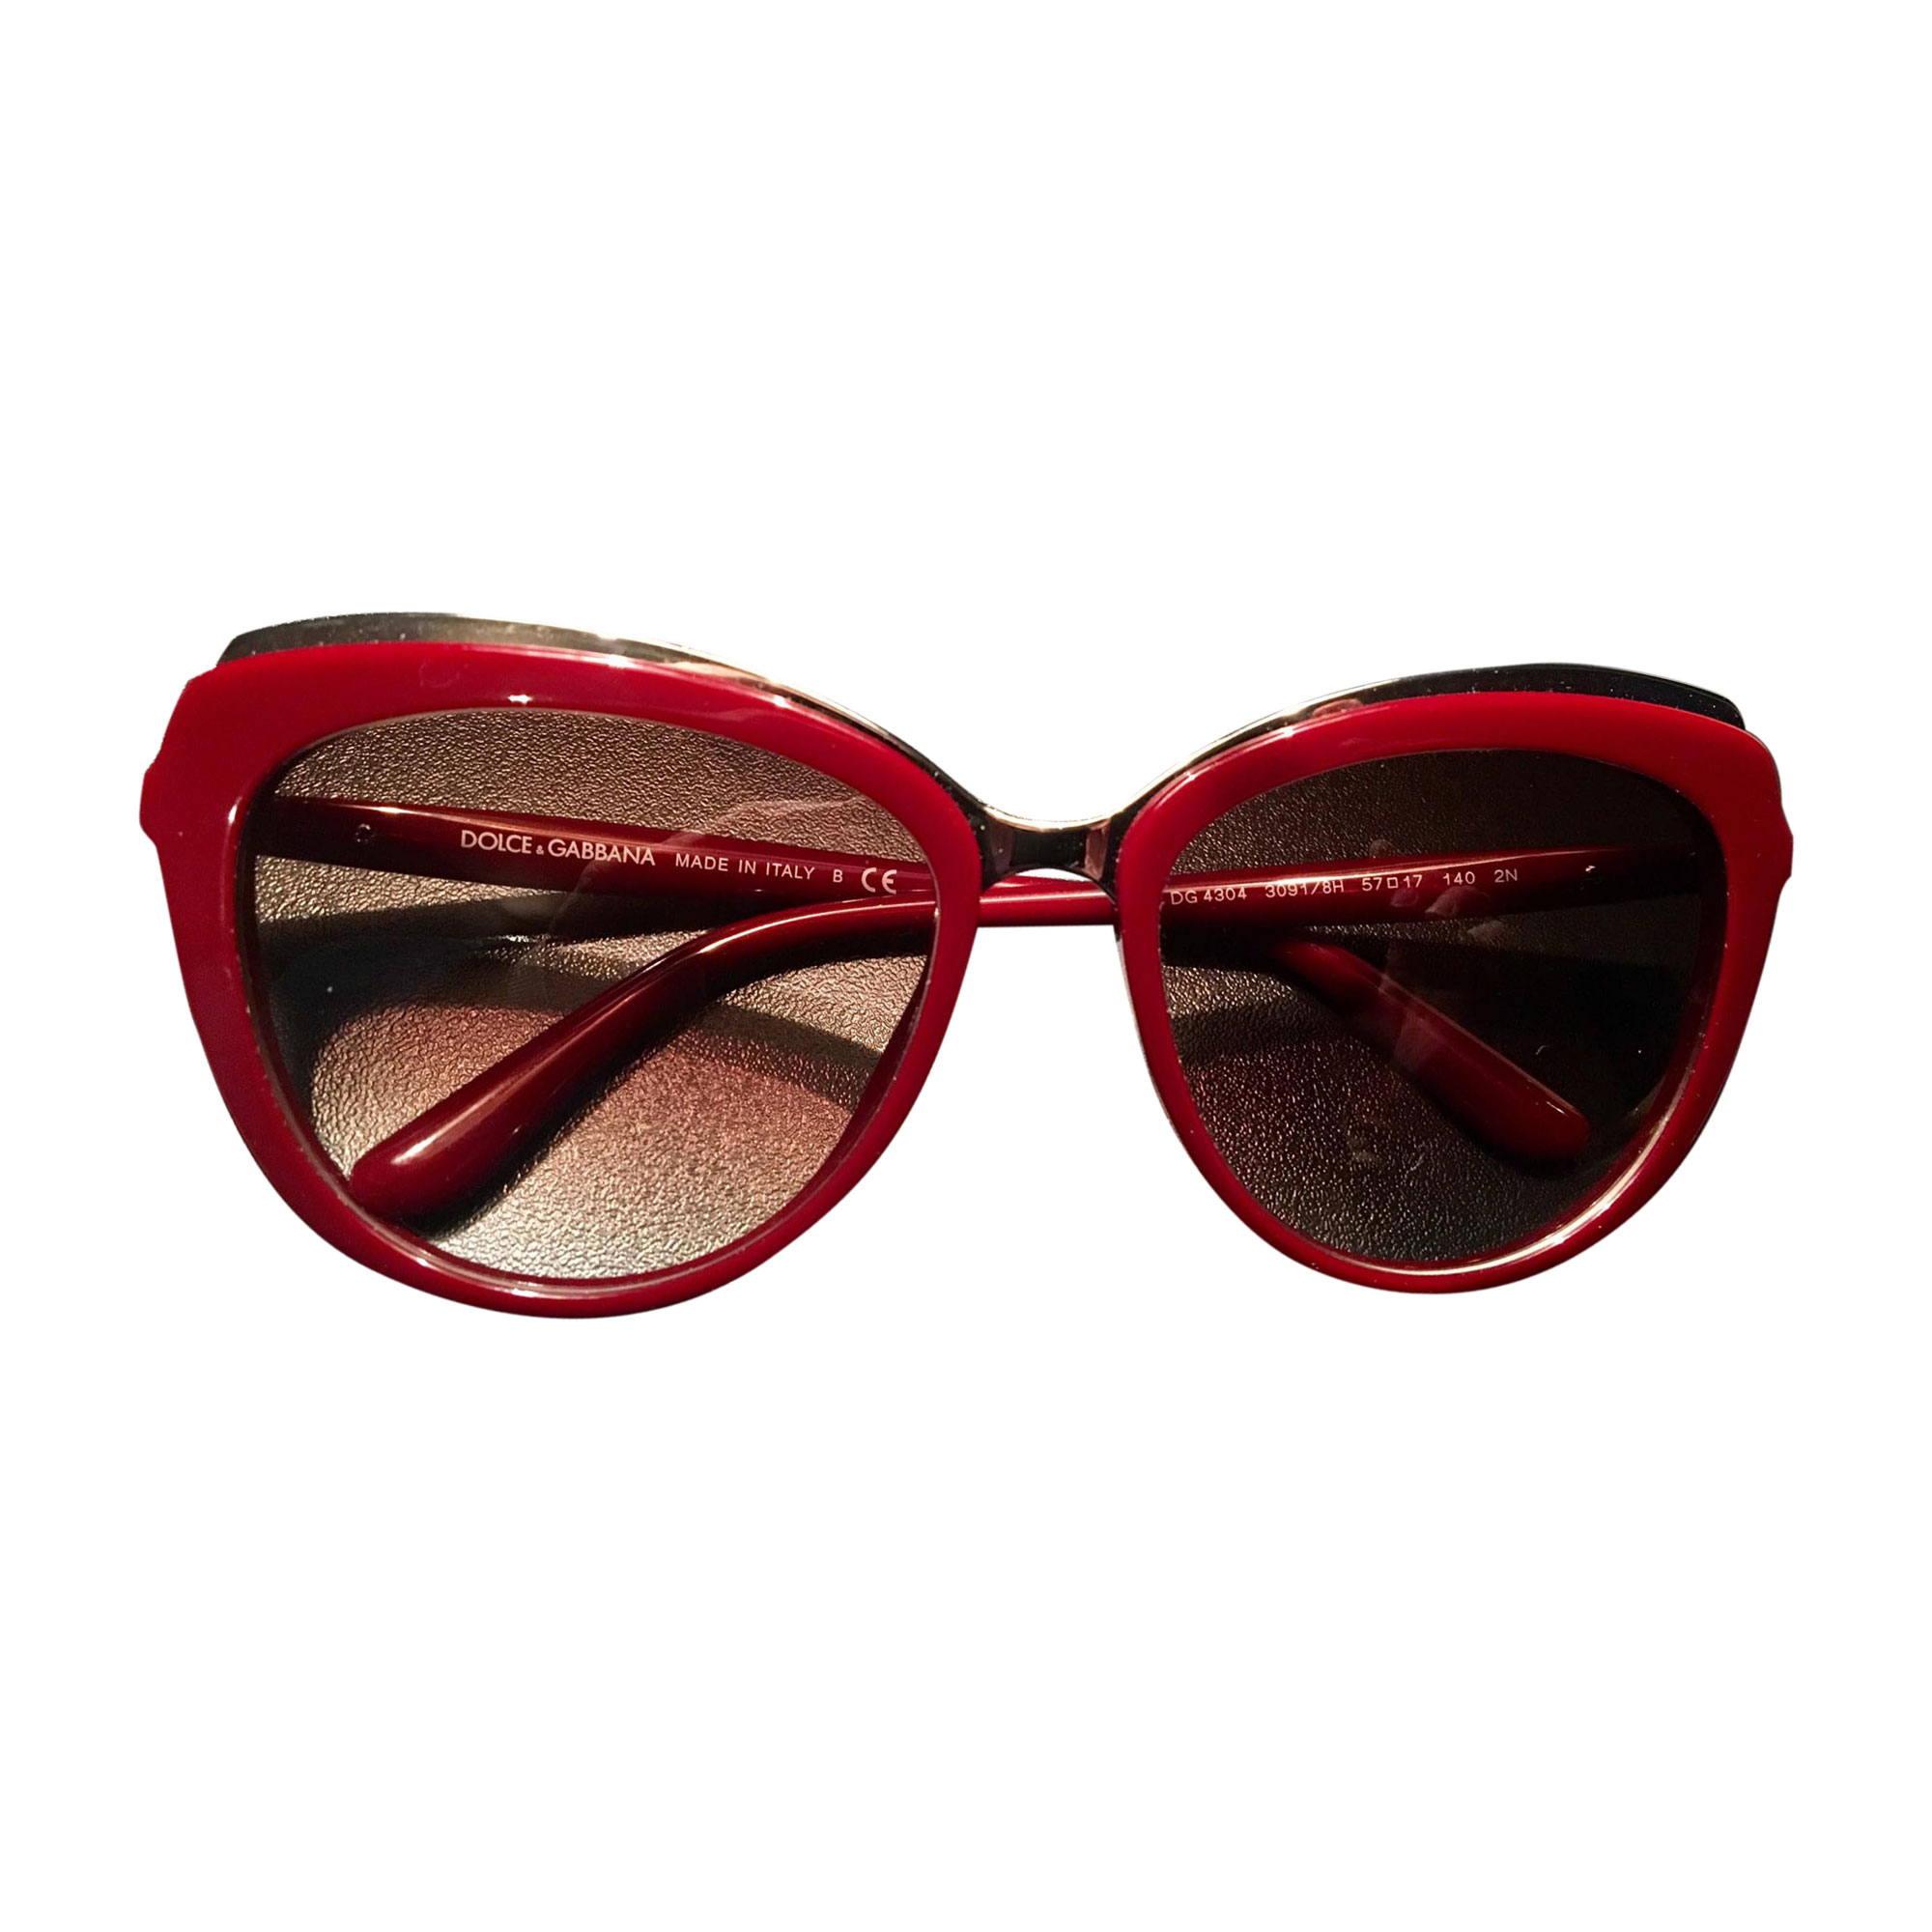 Amp; Dolce De Rouge 7507779 Lunettes Soleil Gabbana Rwxqawoa0 kPOiXZu